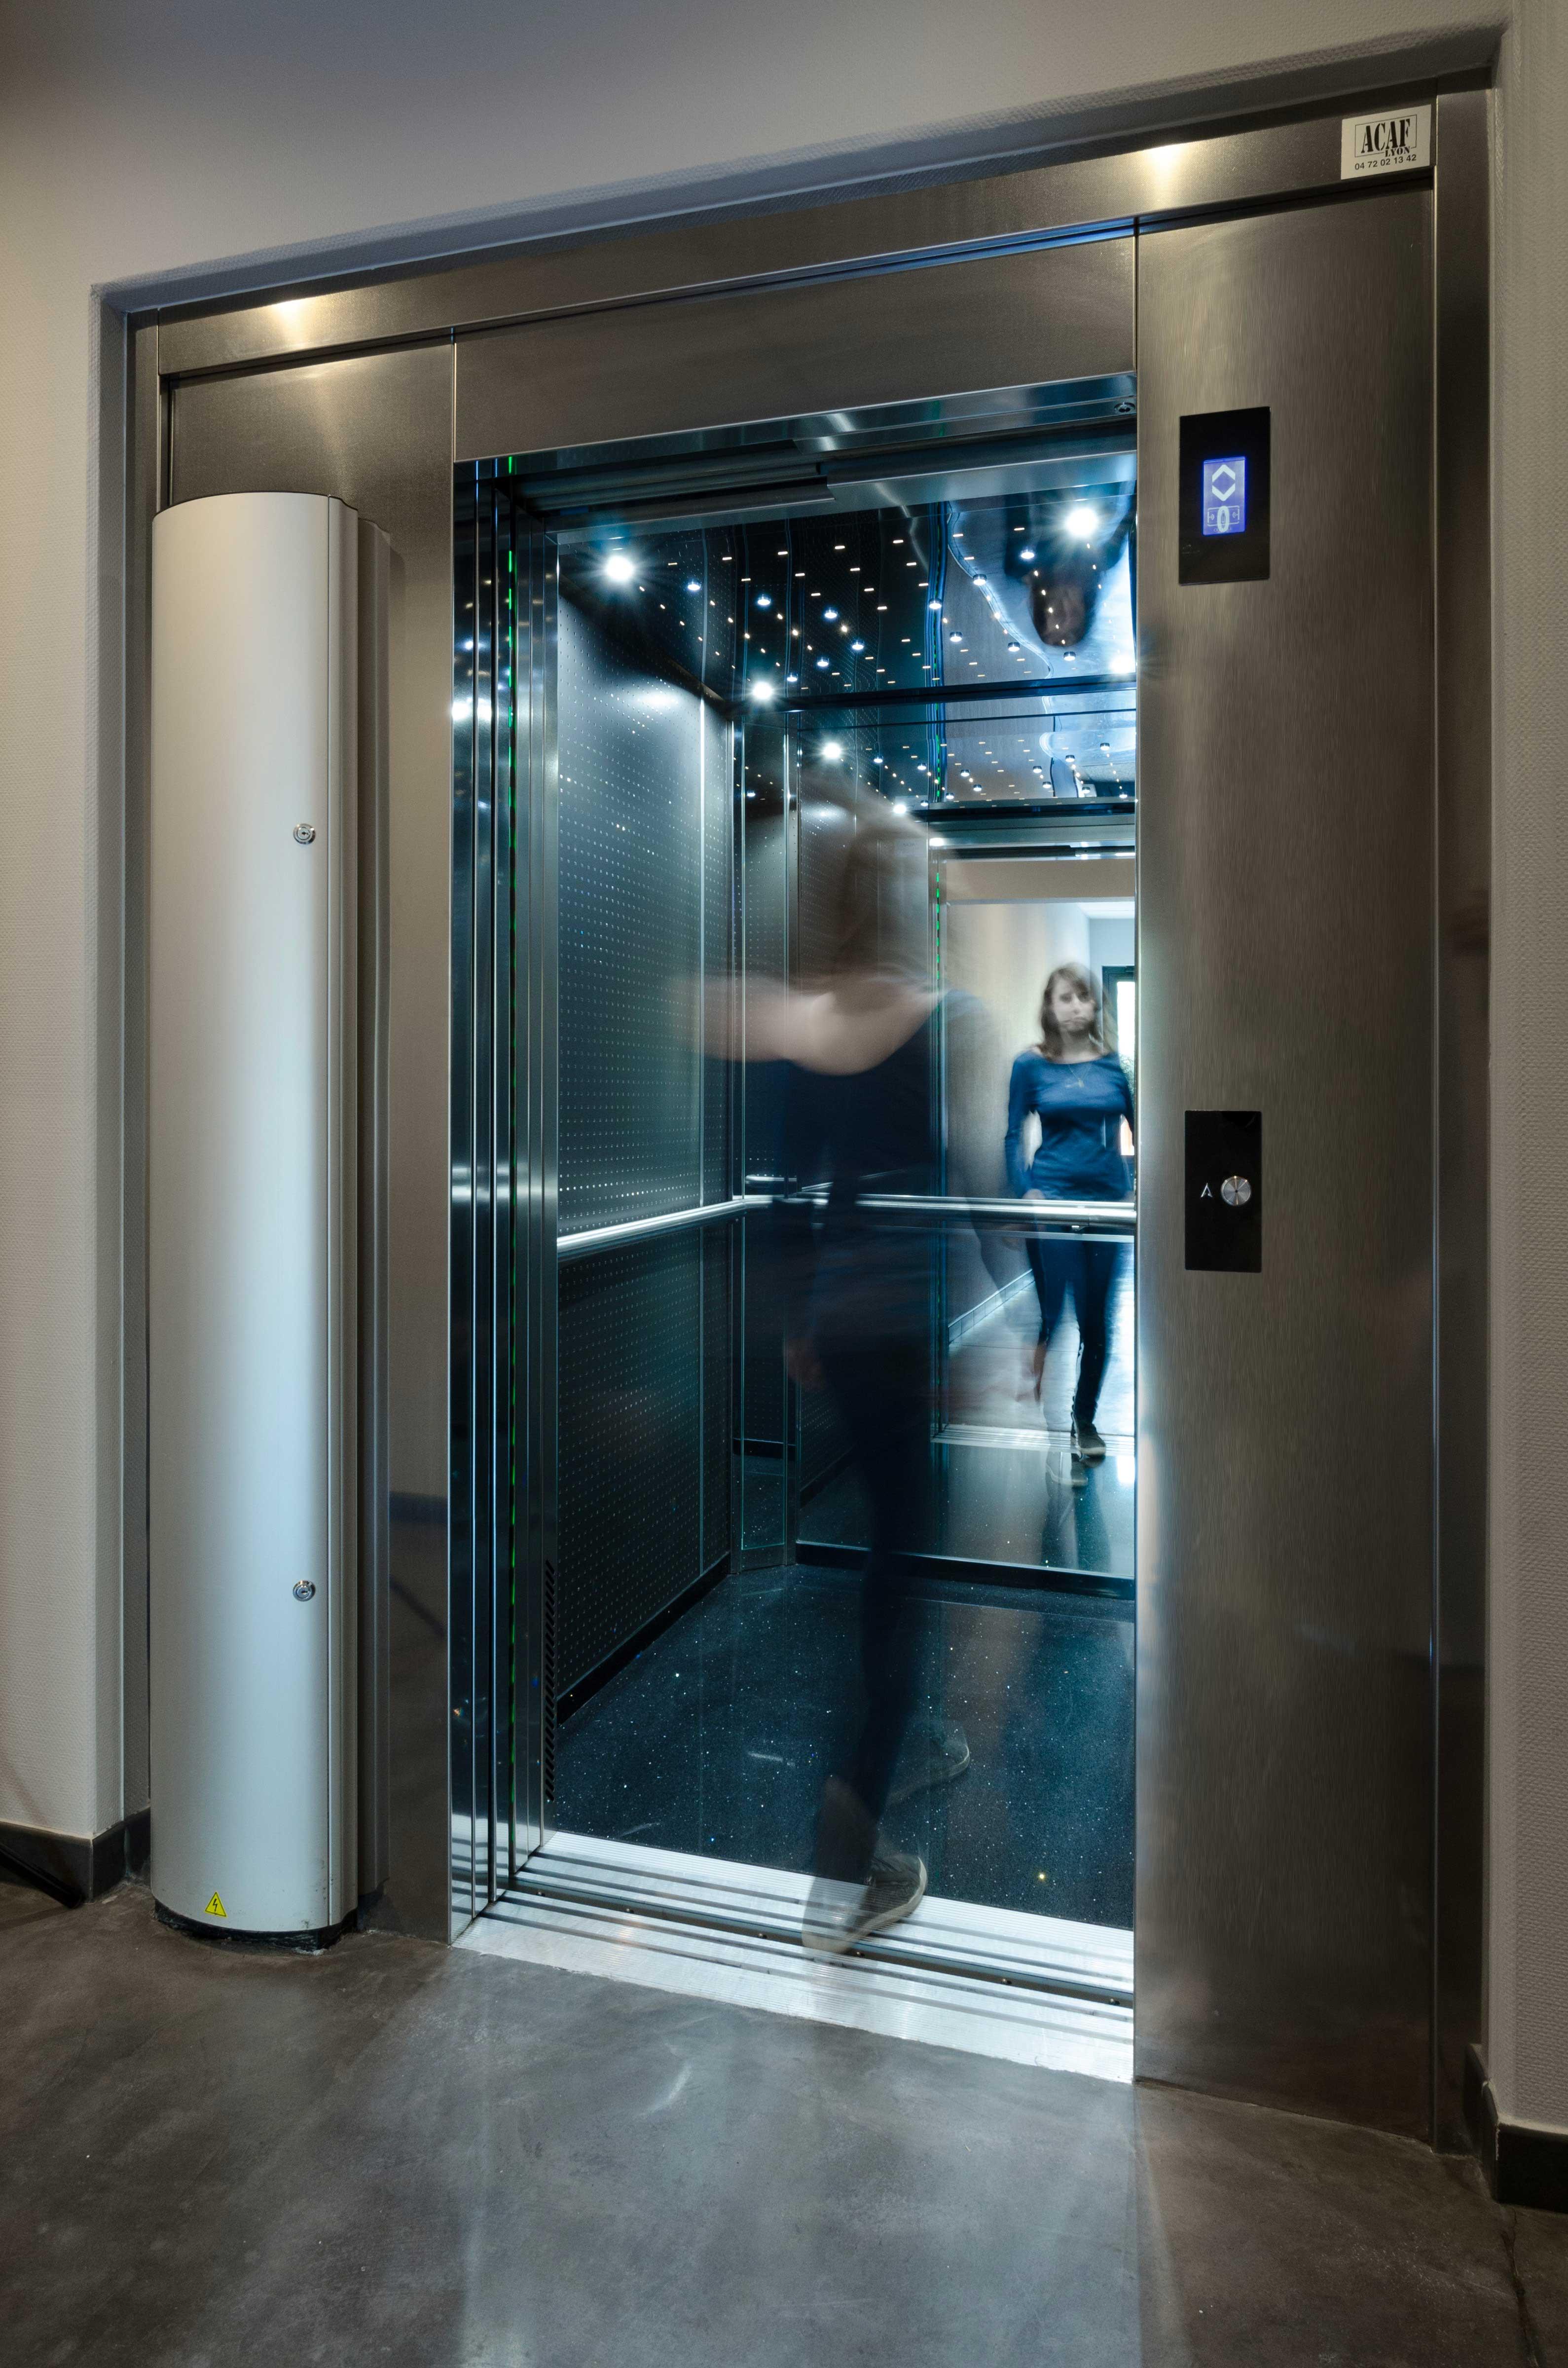 Ascenseur acaf neuf installation réparation maintenance